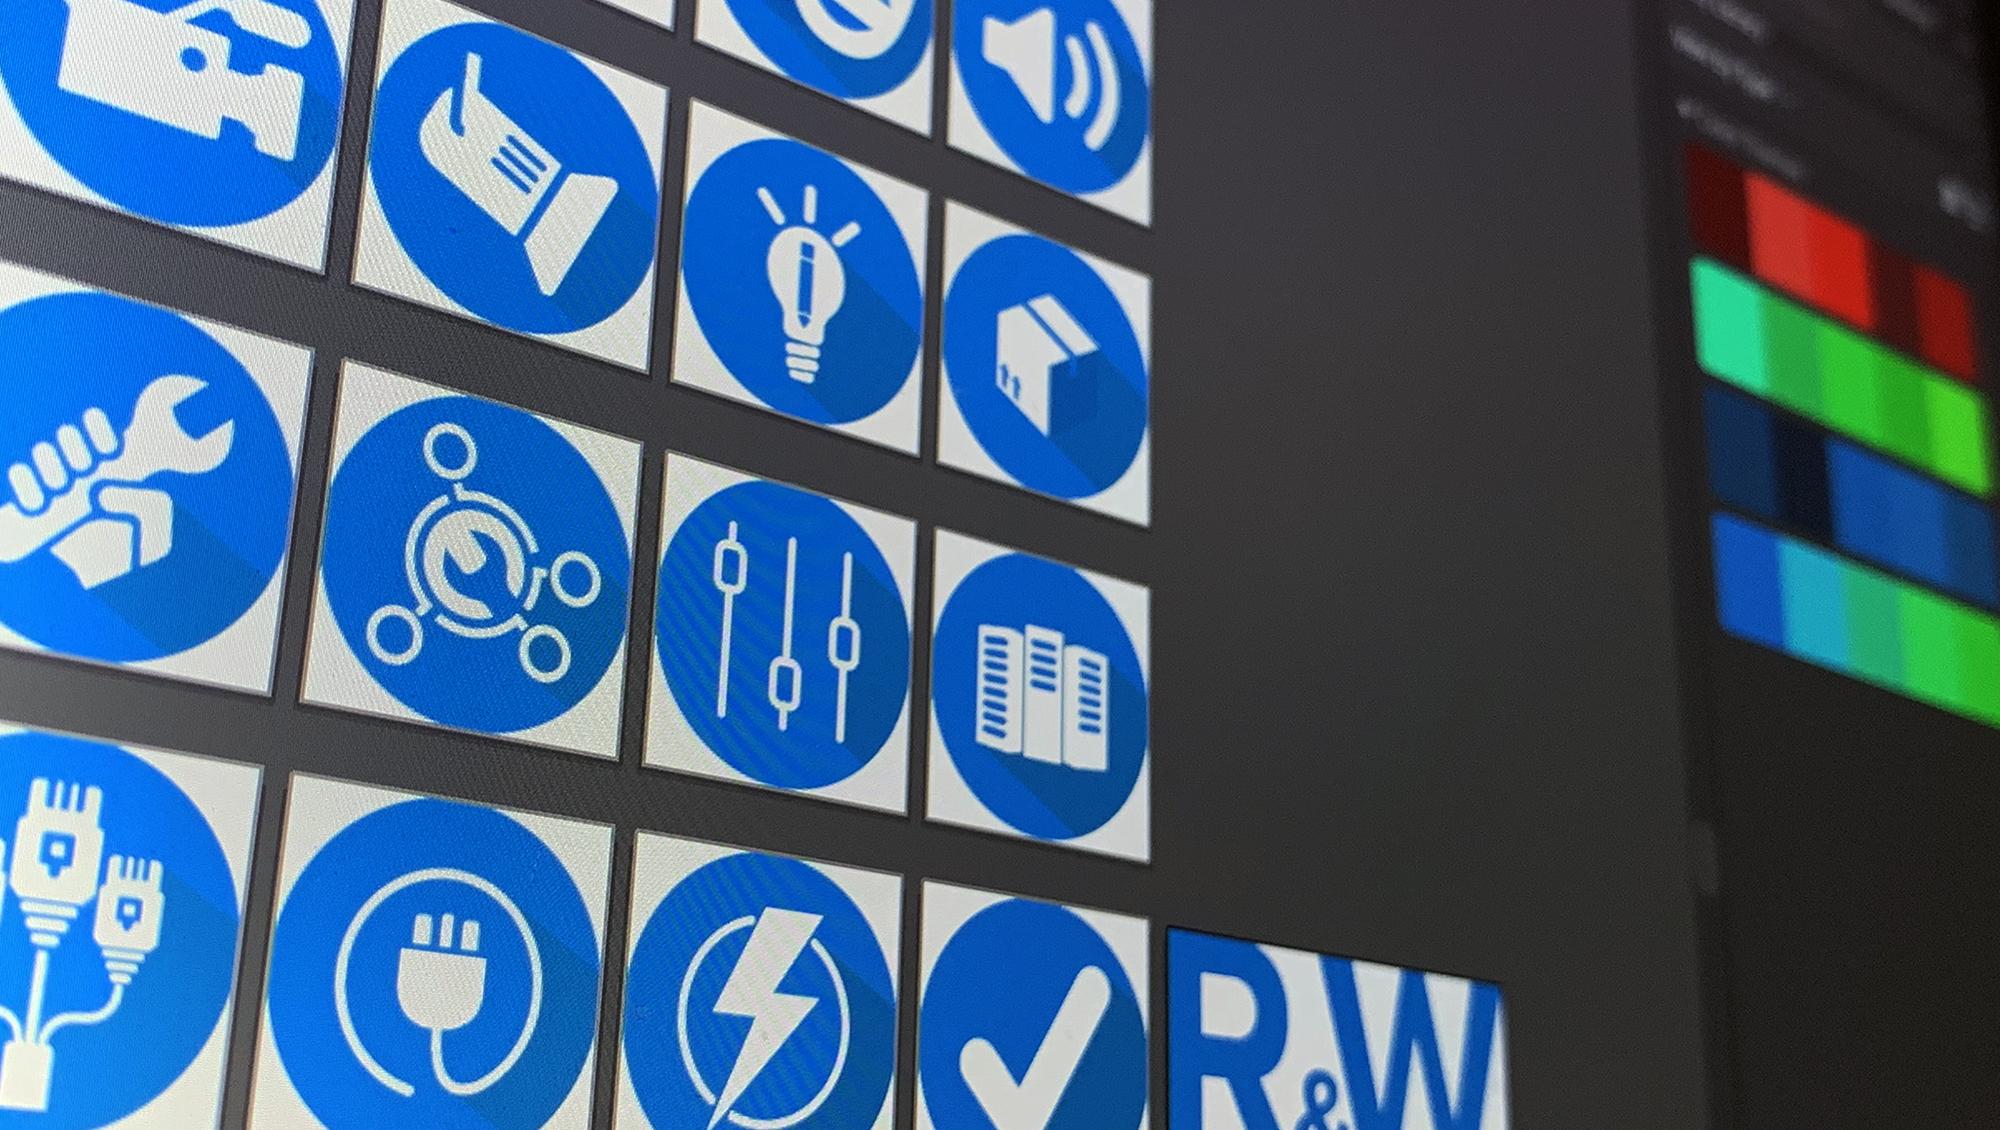 R&W Services